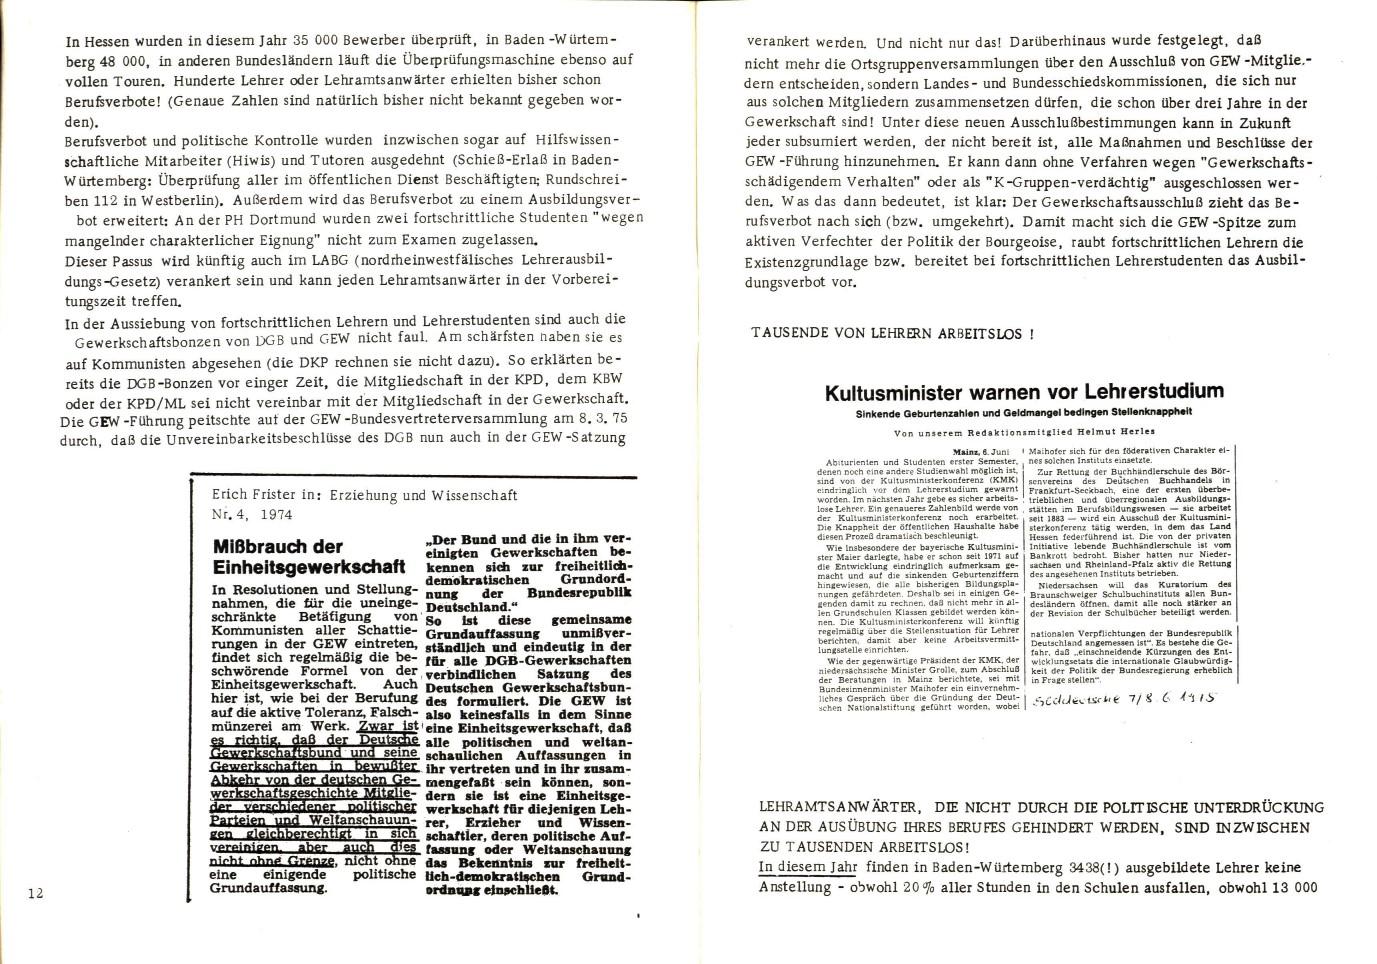 KSV_1975_Lehrerausbildung_07